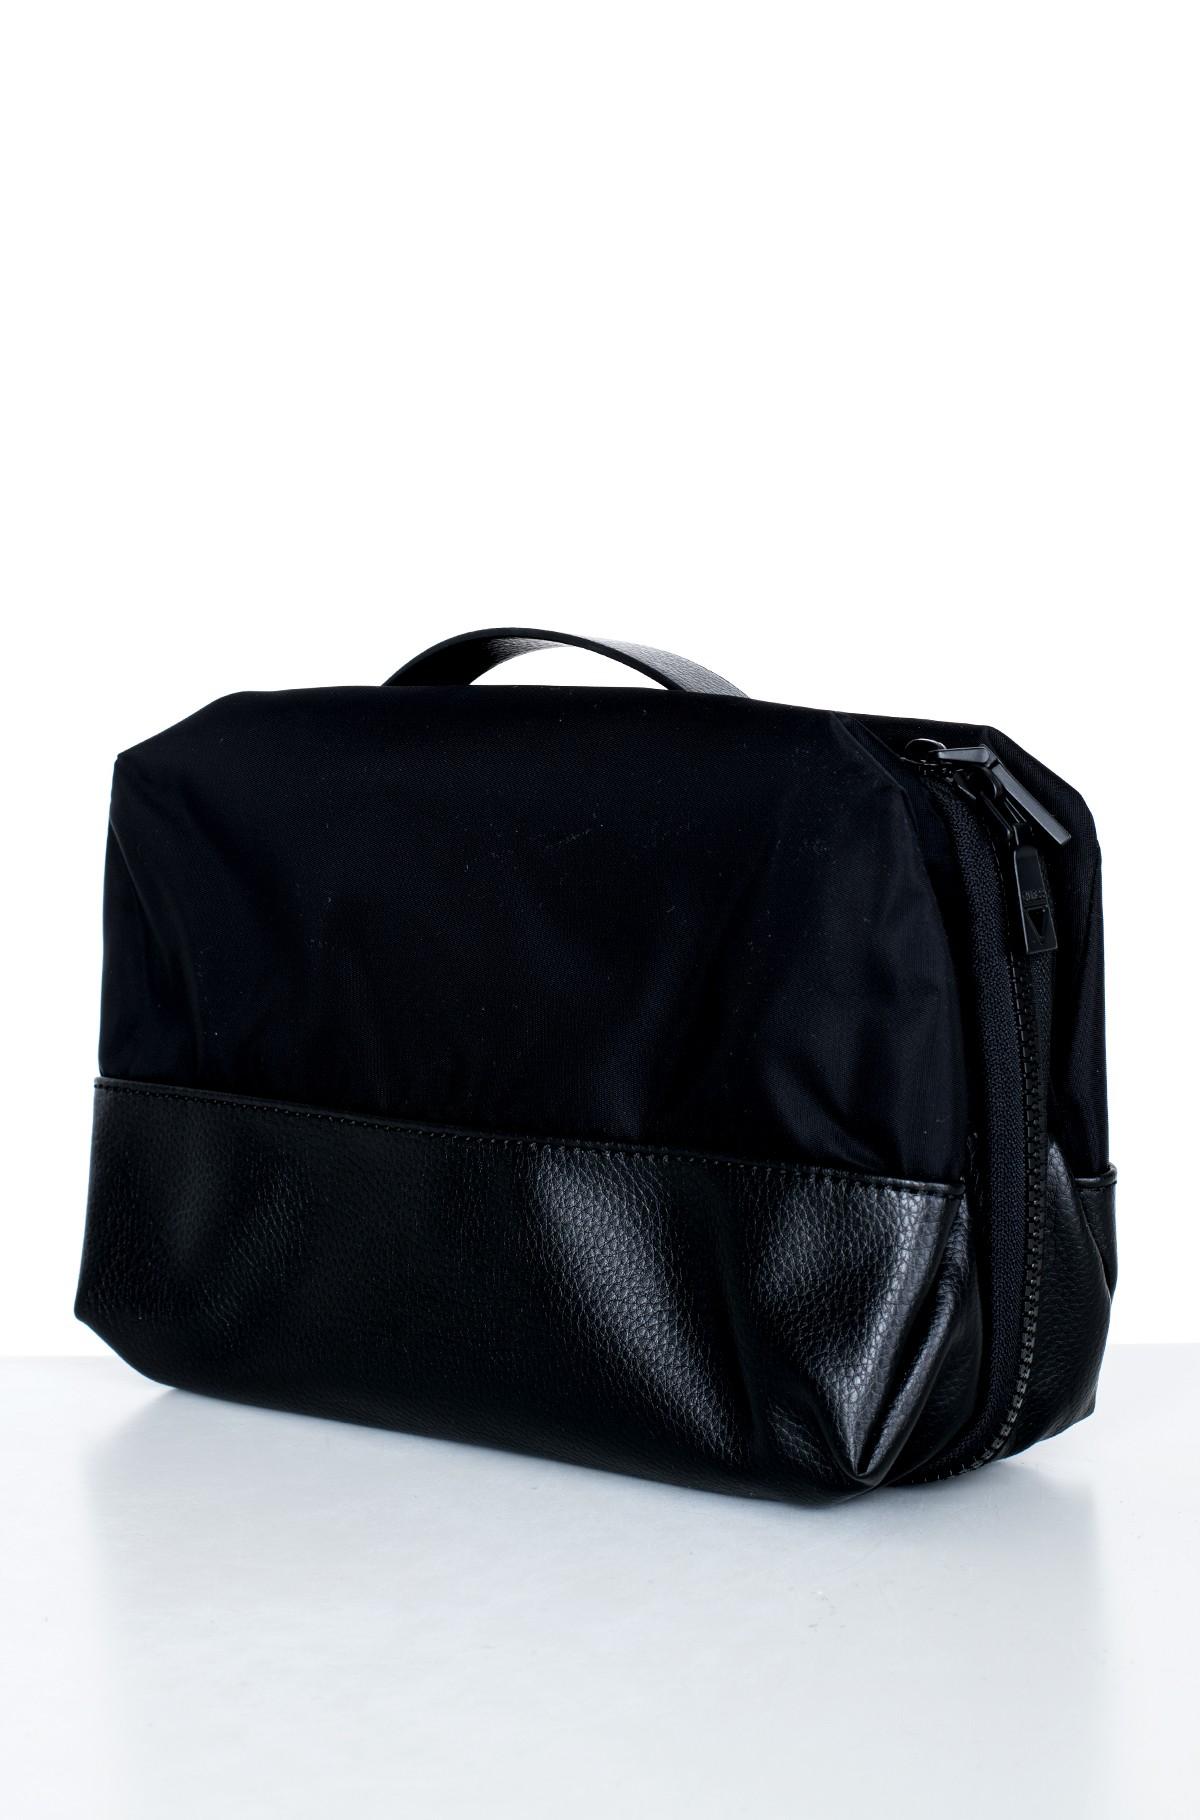 Hügieenitarvete kott HMMSM1 P1142-full-2